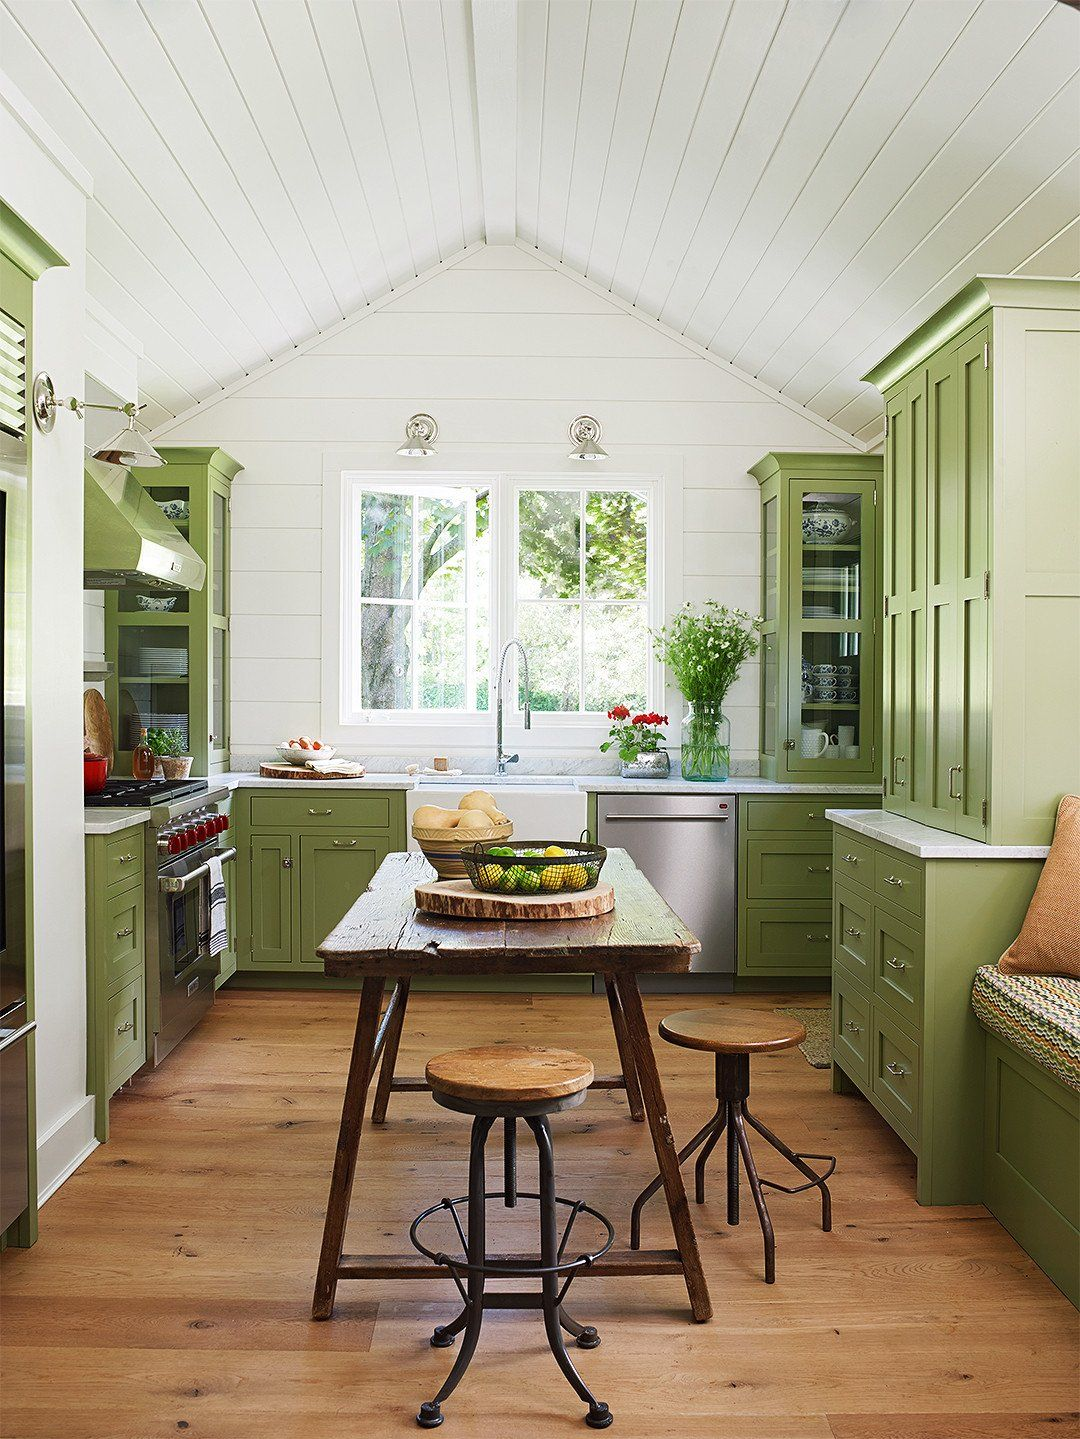 Kitchen And Living Room Designs Combine Elegant 25 Beautiful Country Kitchens To Copy Asap Dapur Pedesaan Model Dapur Dapur Rustic